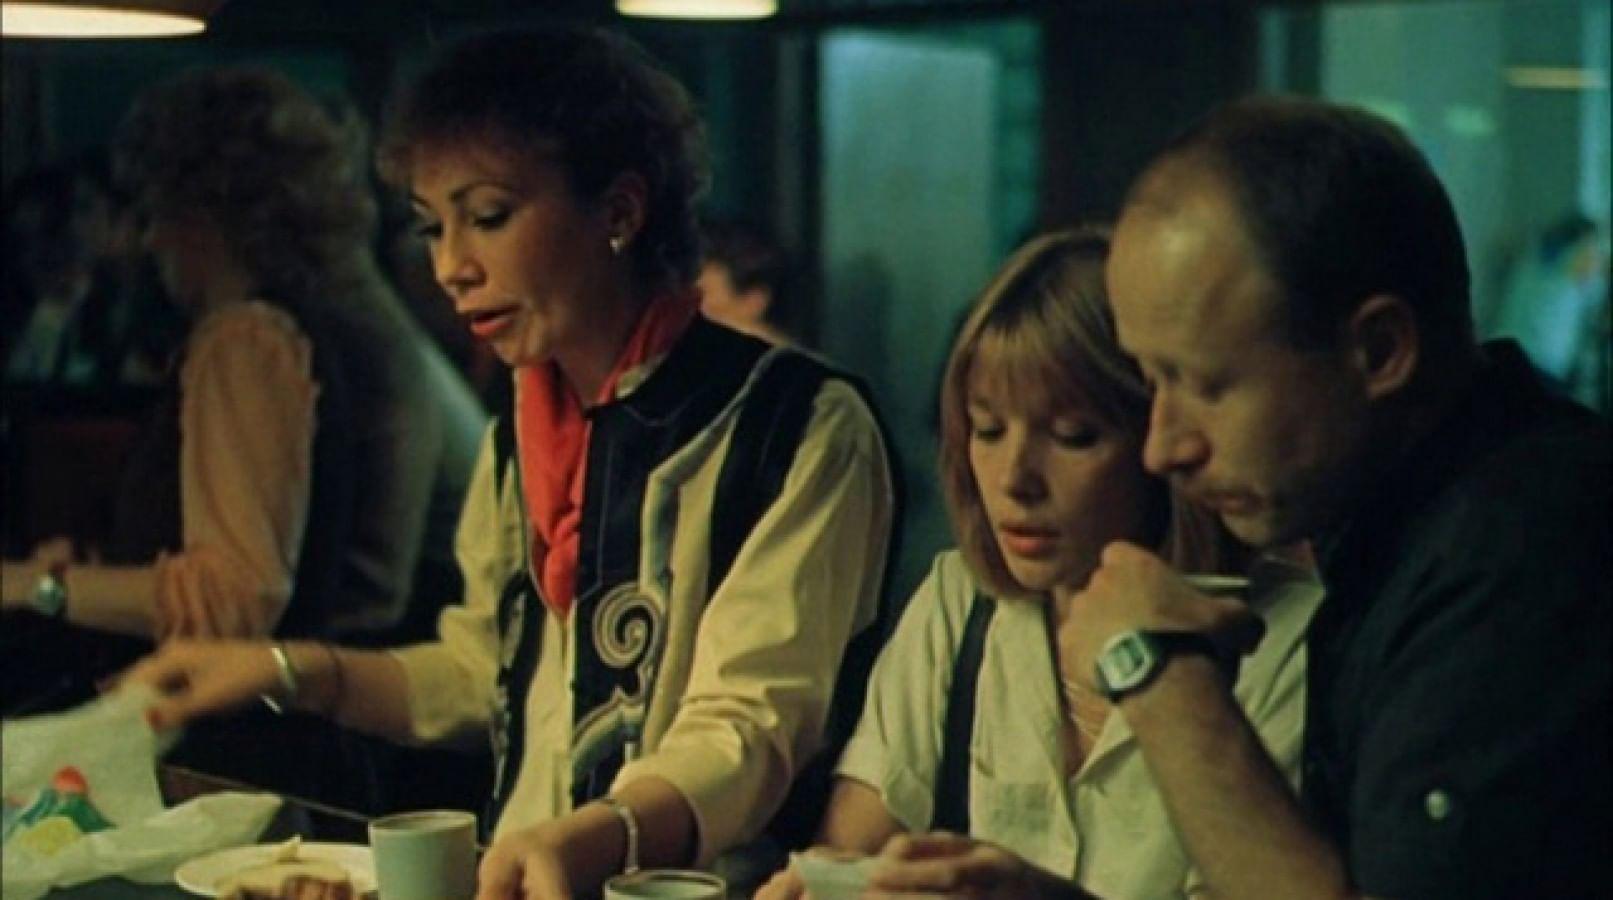 Кадры из фильма «Выйти замуж за капитана»